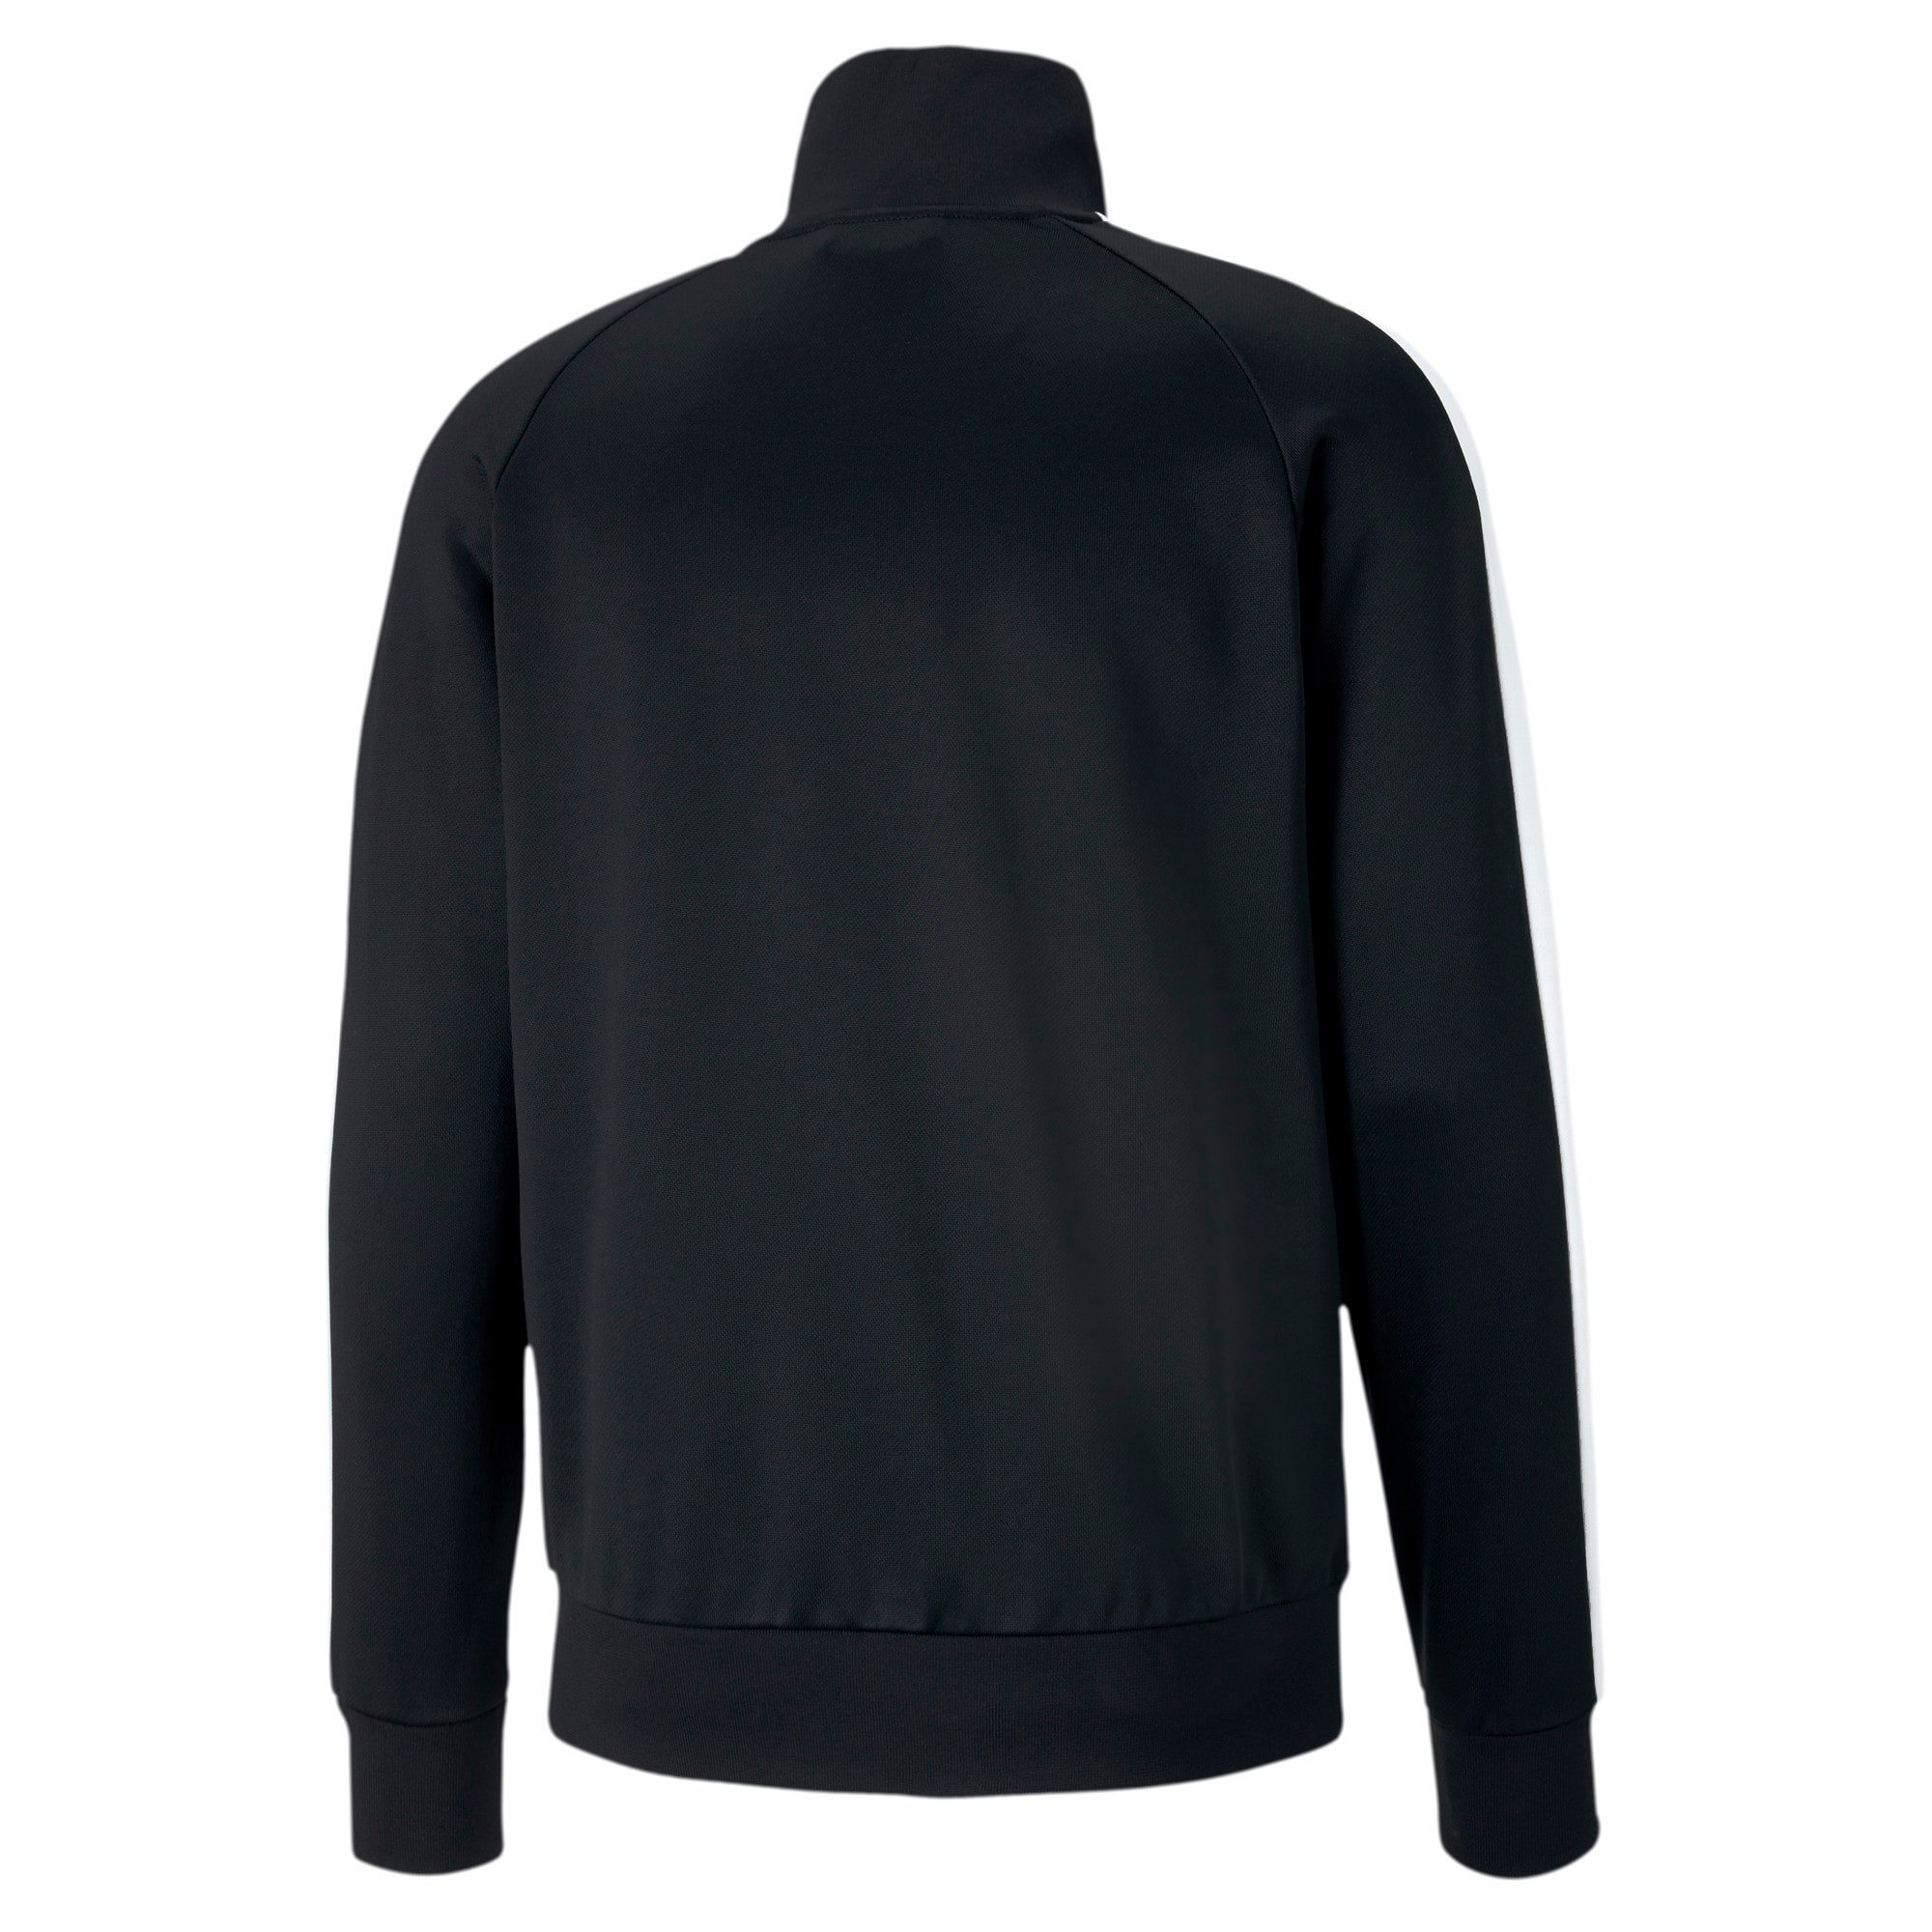 Thumbnail 5 of Iconic T7 Men's Track Jacket, Puma Black, medium